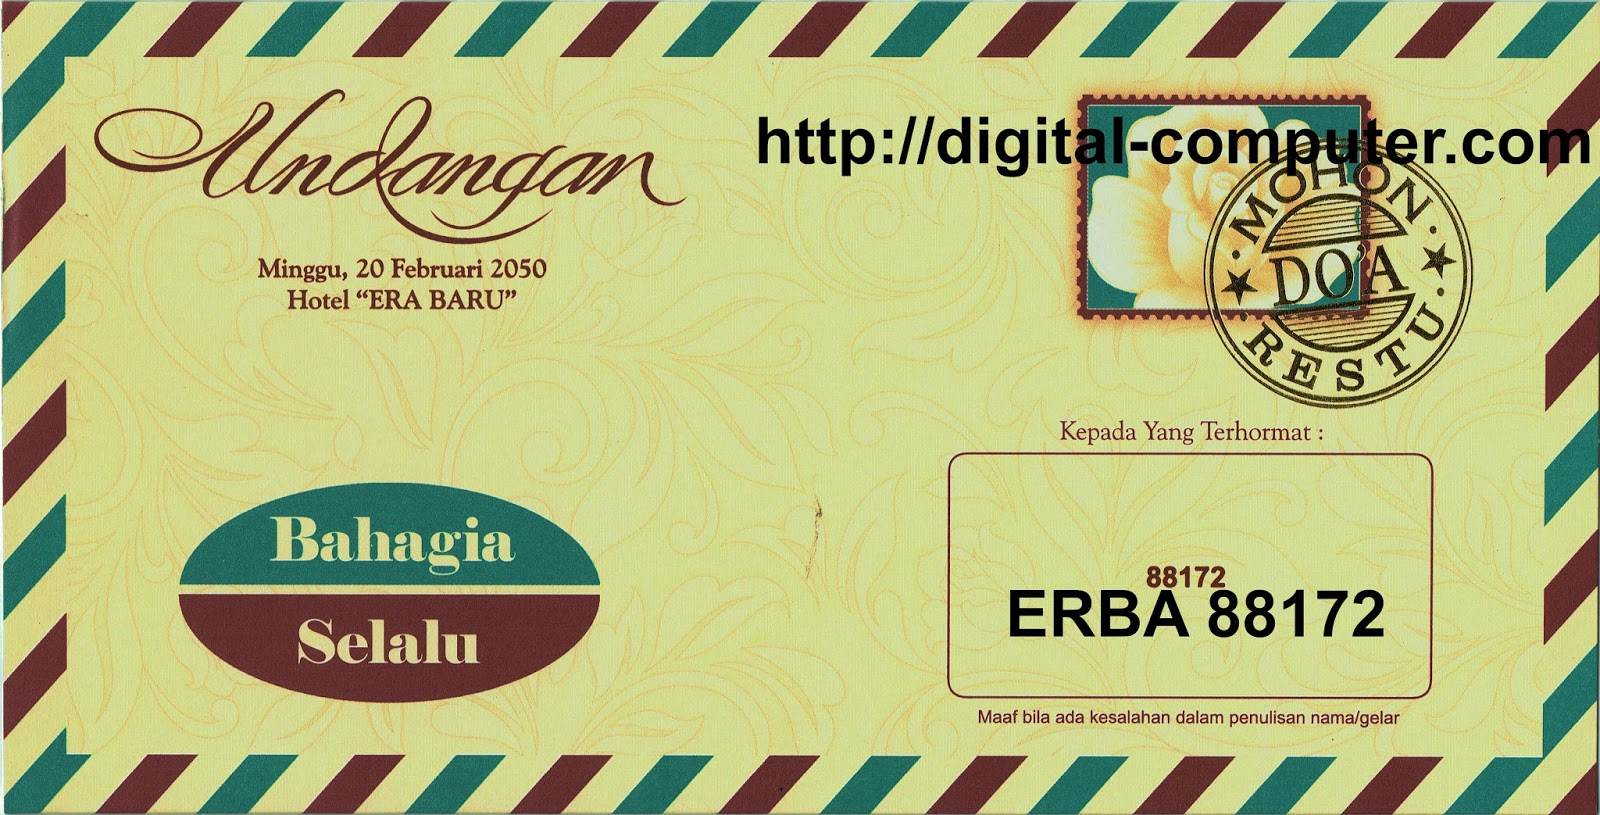 Undangan Softcover ERBA 88172